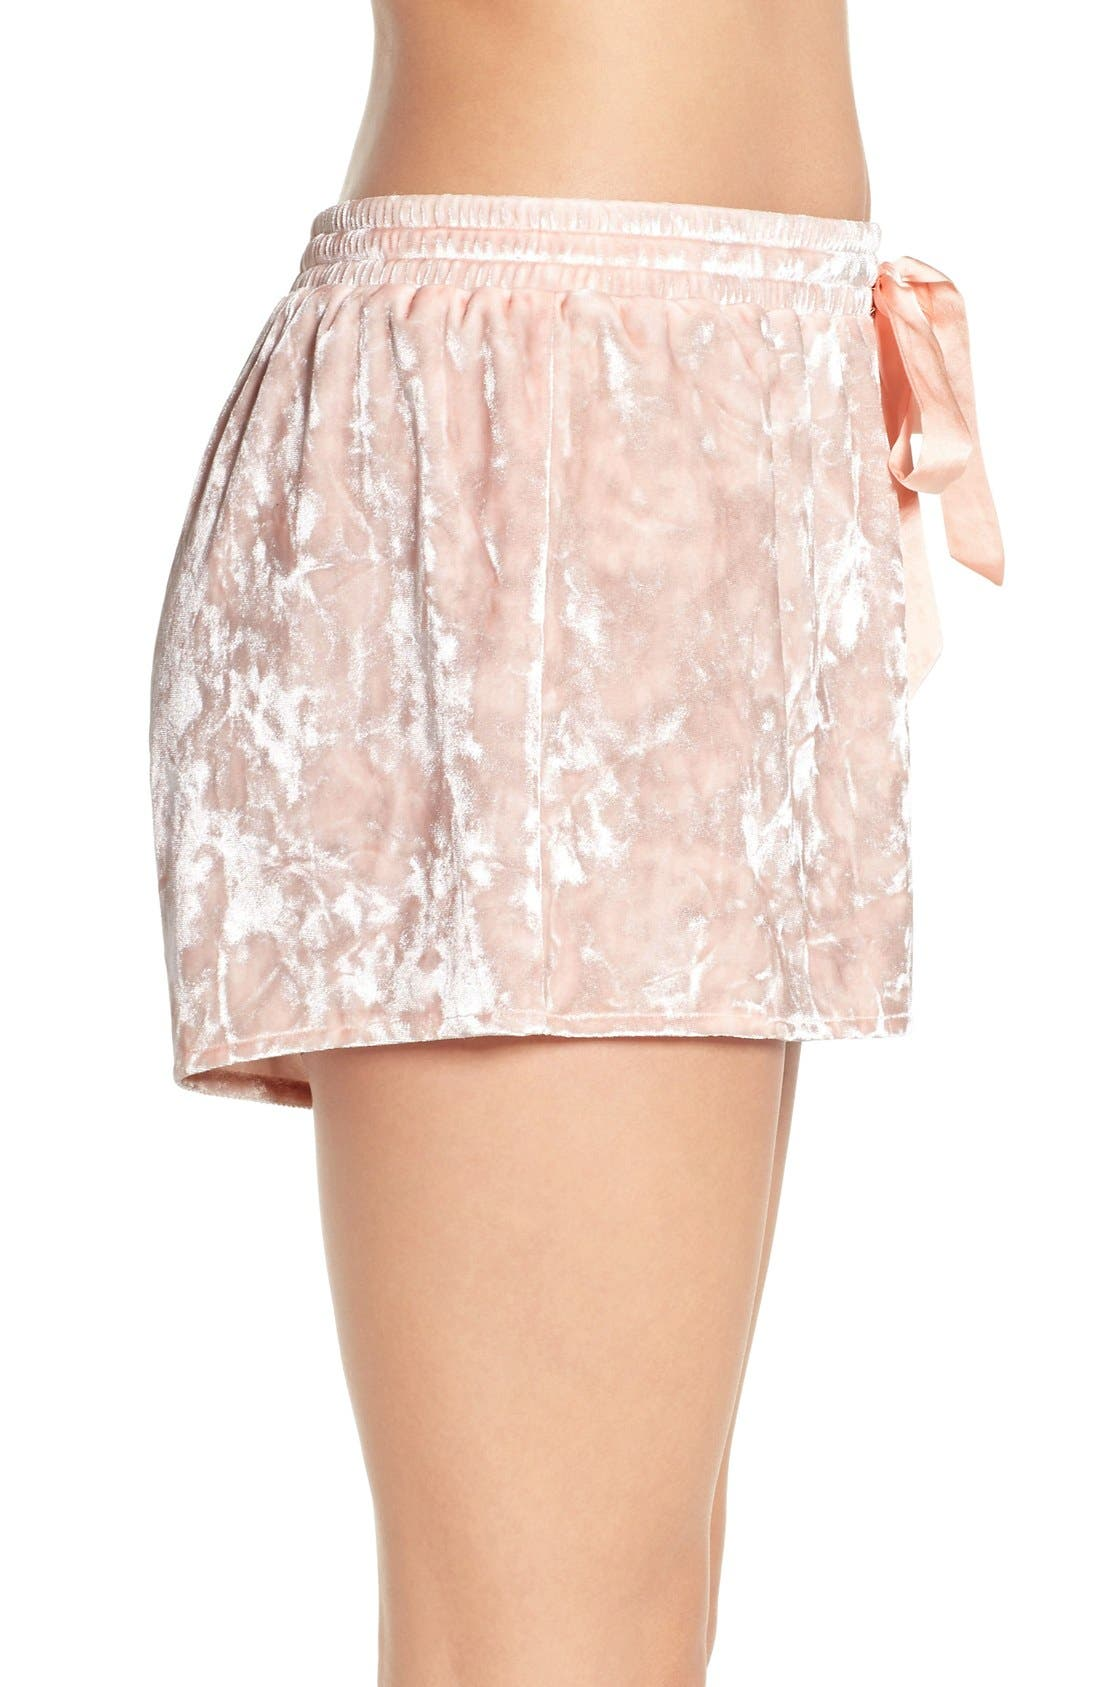 Crushed Velvet Shorts,                             Alternate thumbnail 3, color,                             Pink Wood